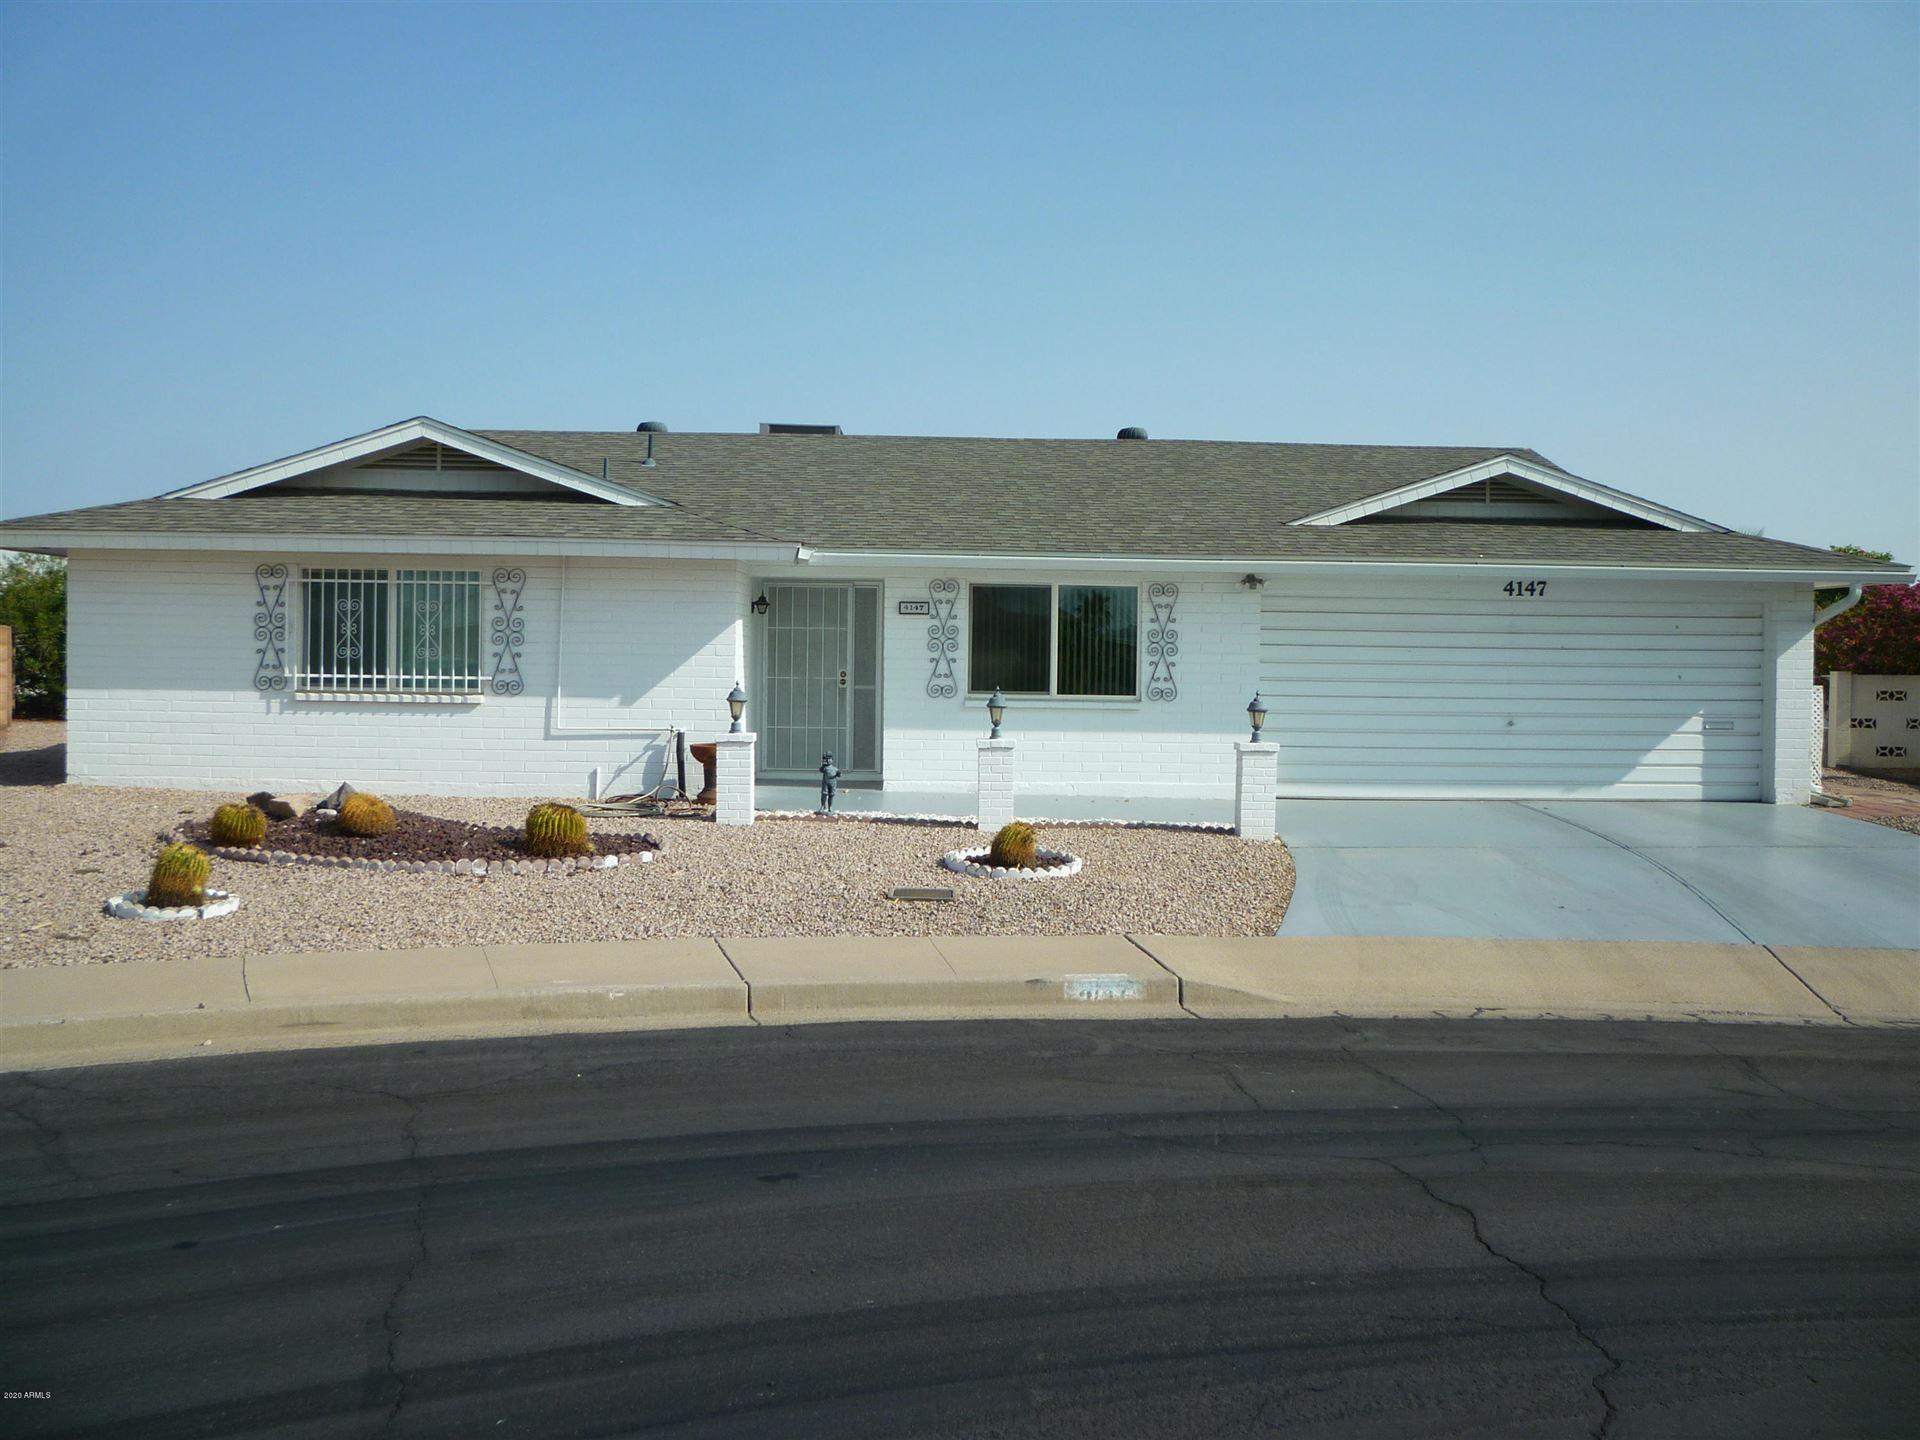 4147 E CAROL Avenue, Mesa, AZ 85206 - MLS#: 6135279